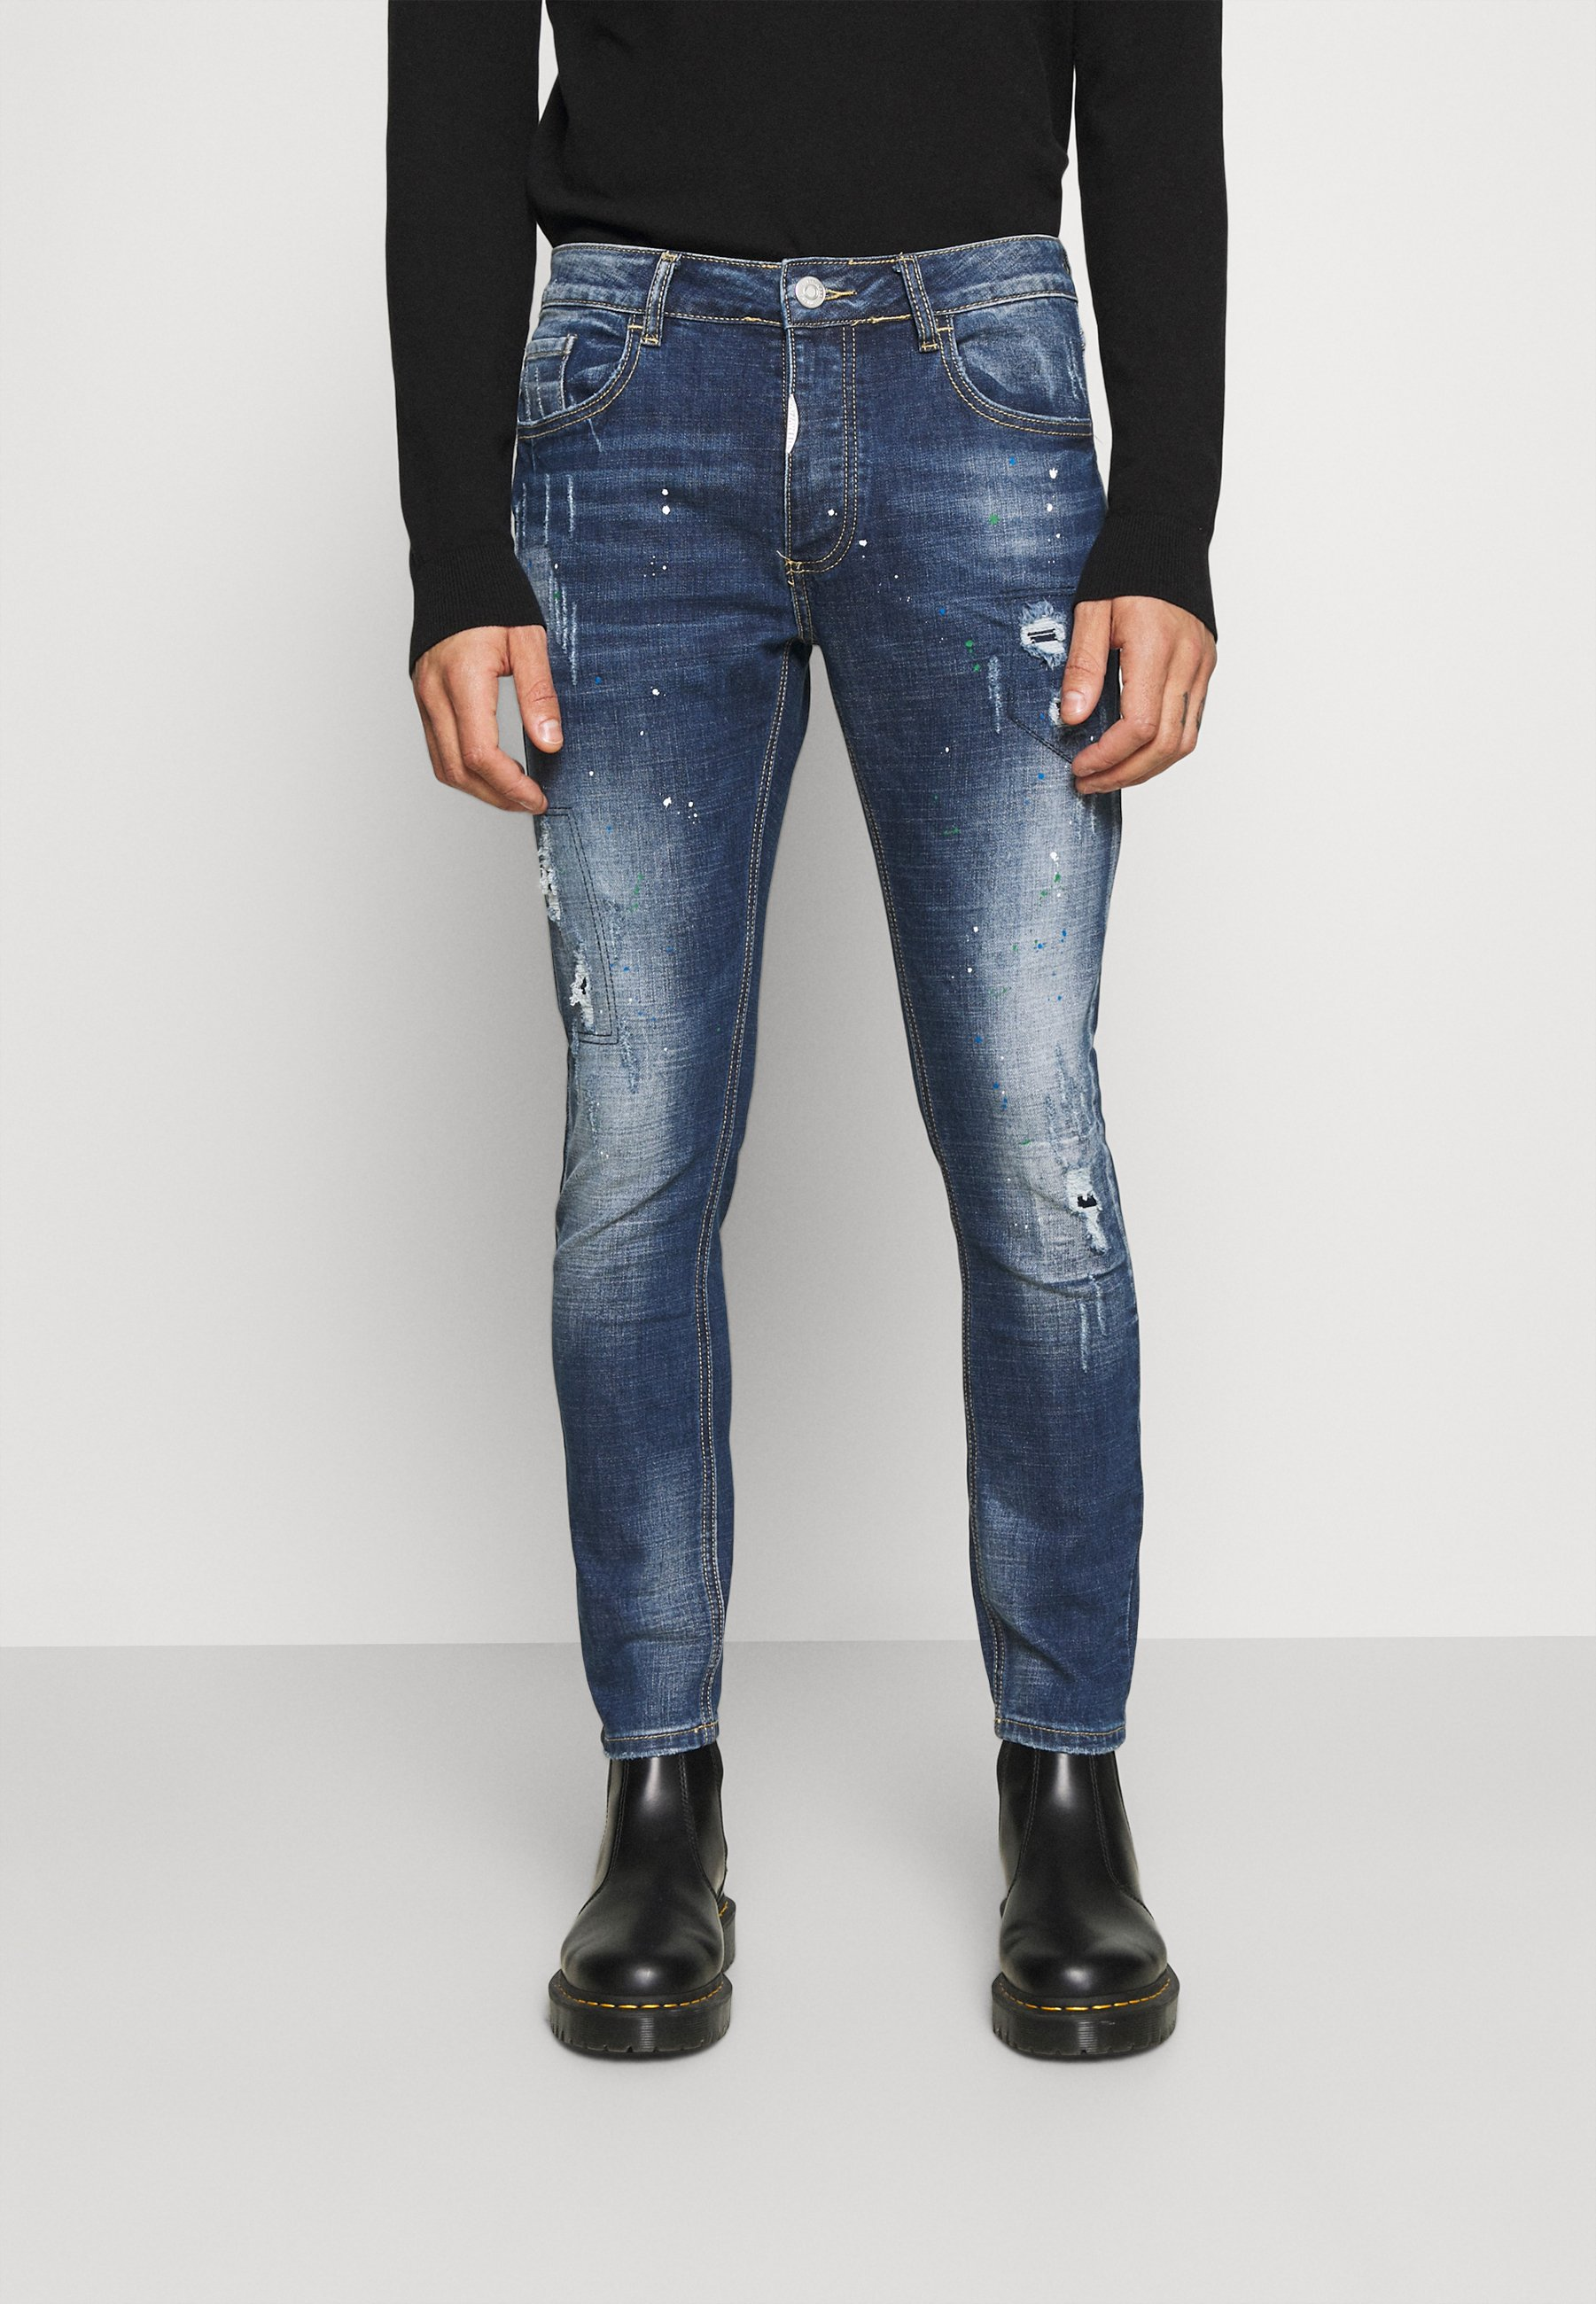 Uomo ICARDI - Jeans slim fit